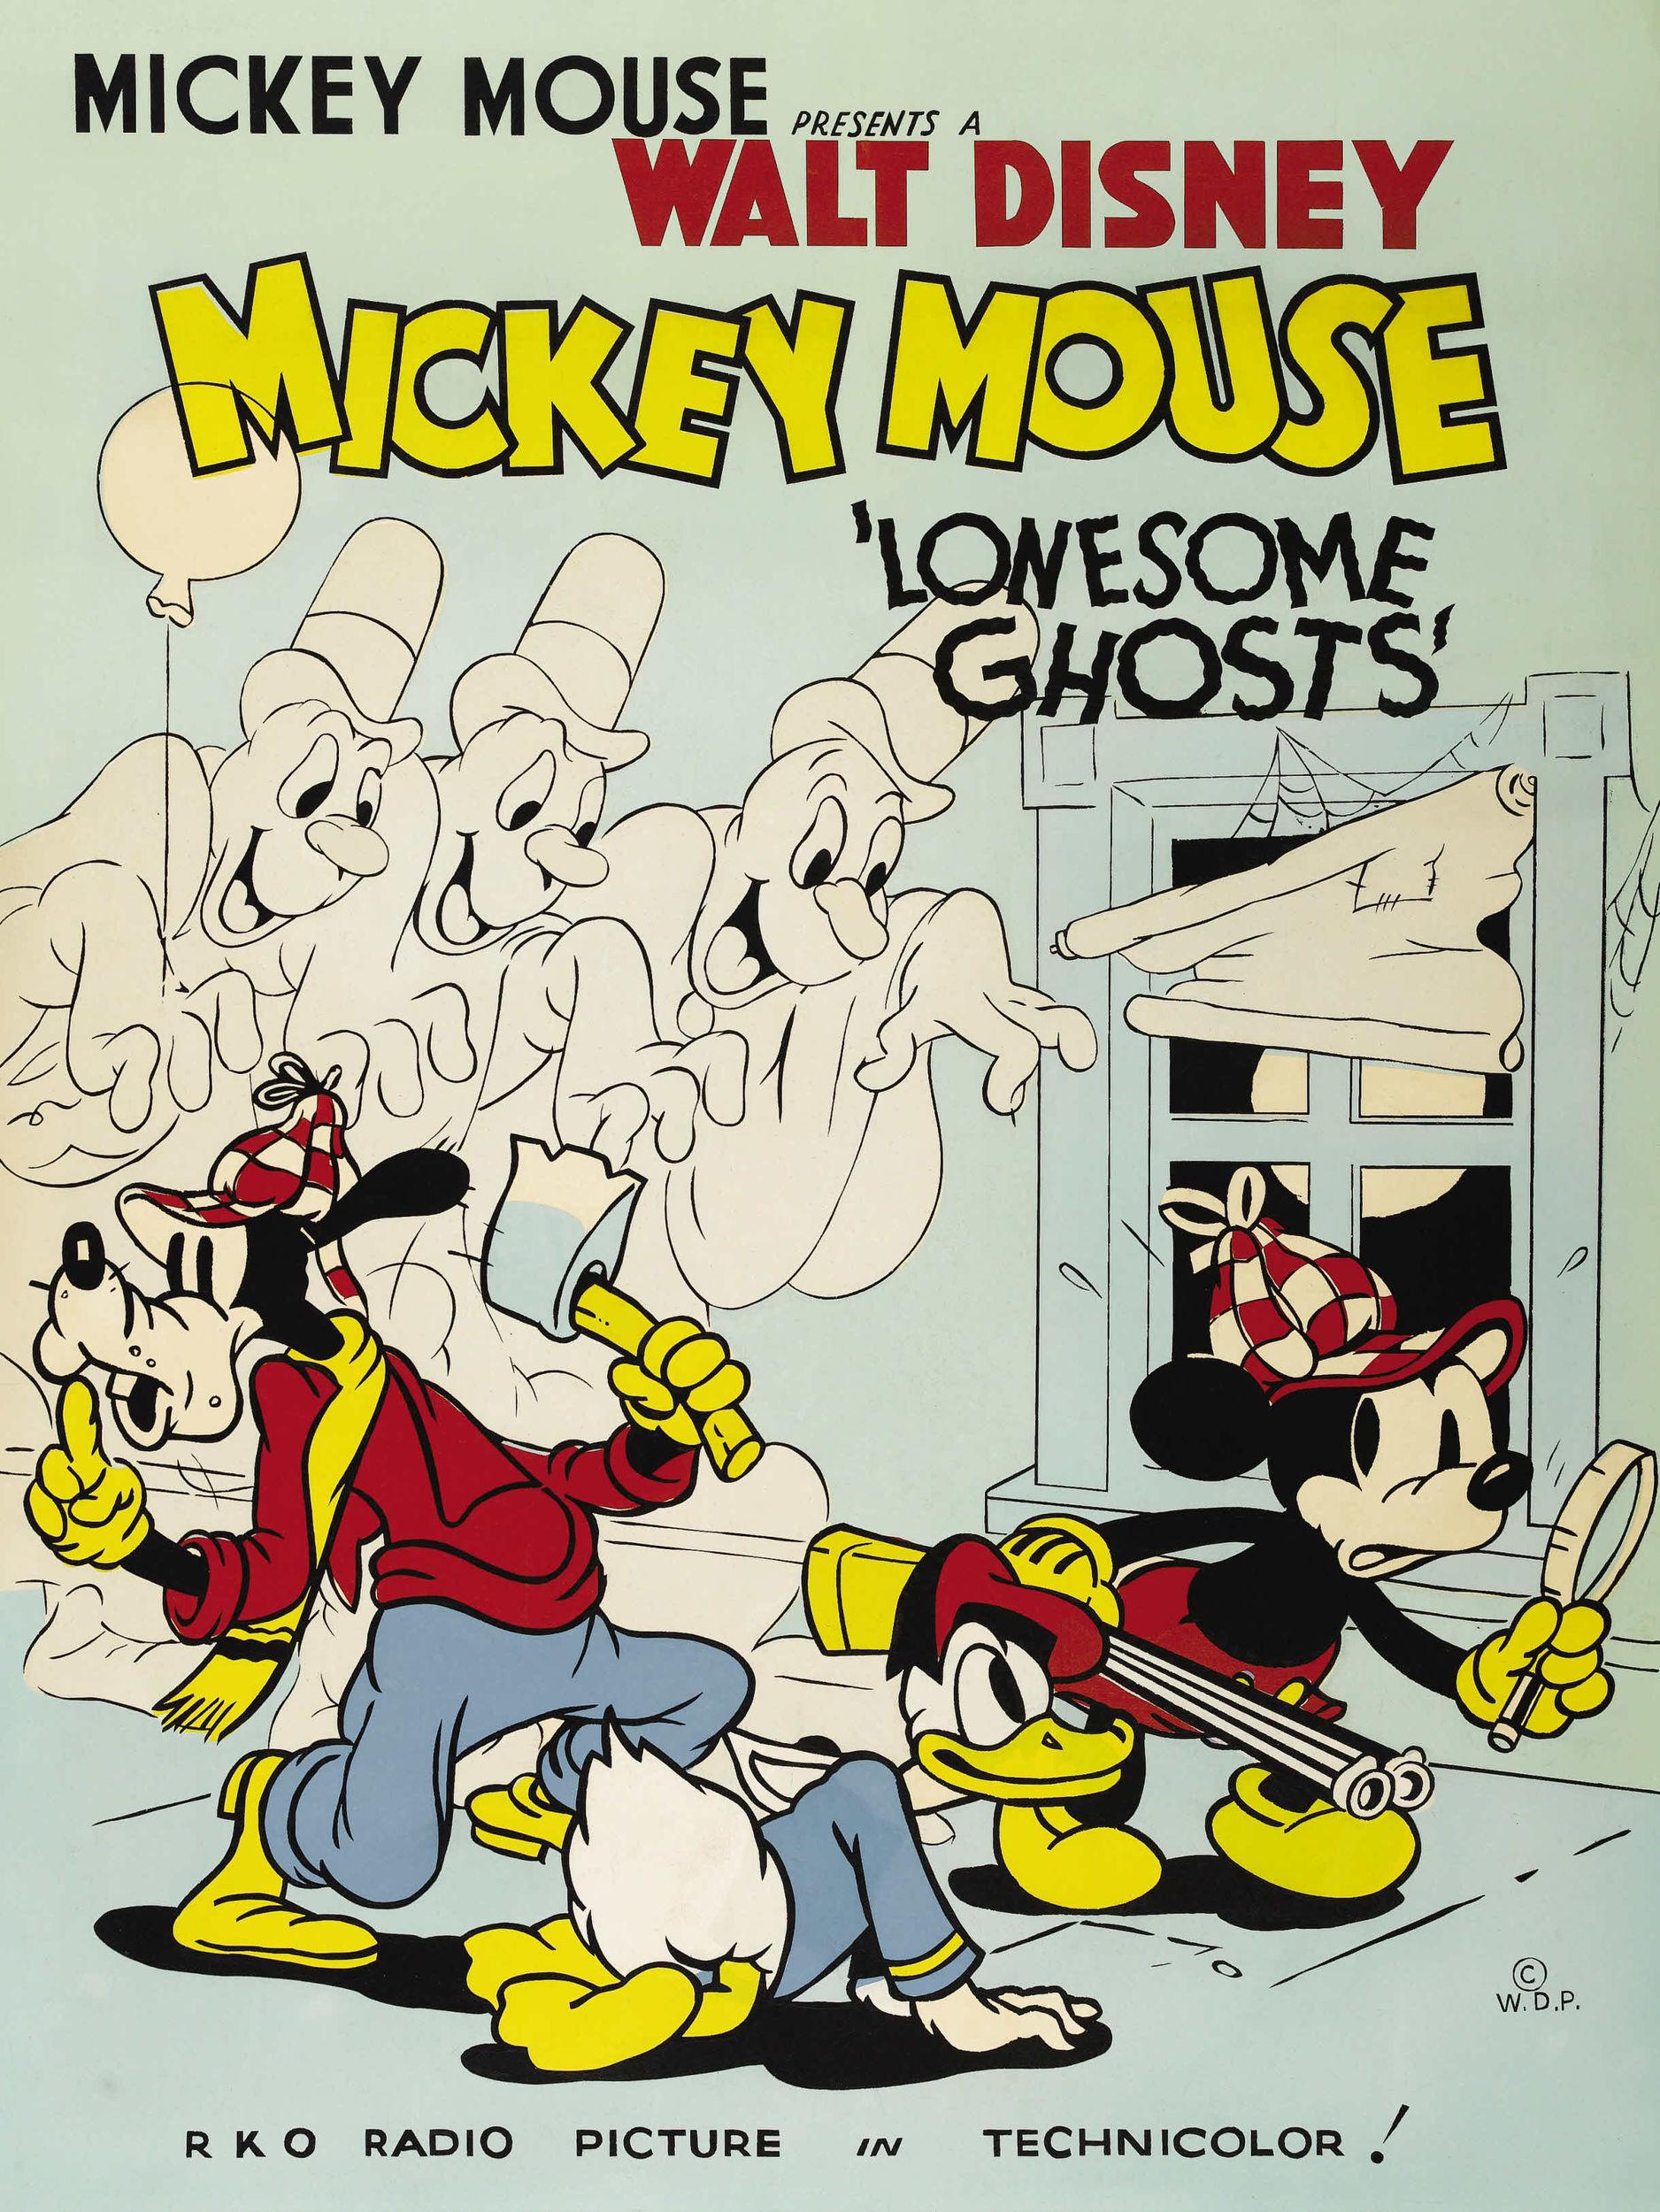 Lonesome Ghosts Disney Short Ghostbusters Wiki Fandom Powered By Wikia